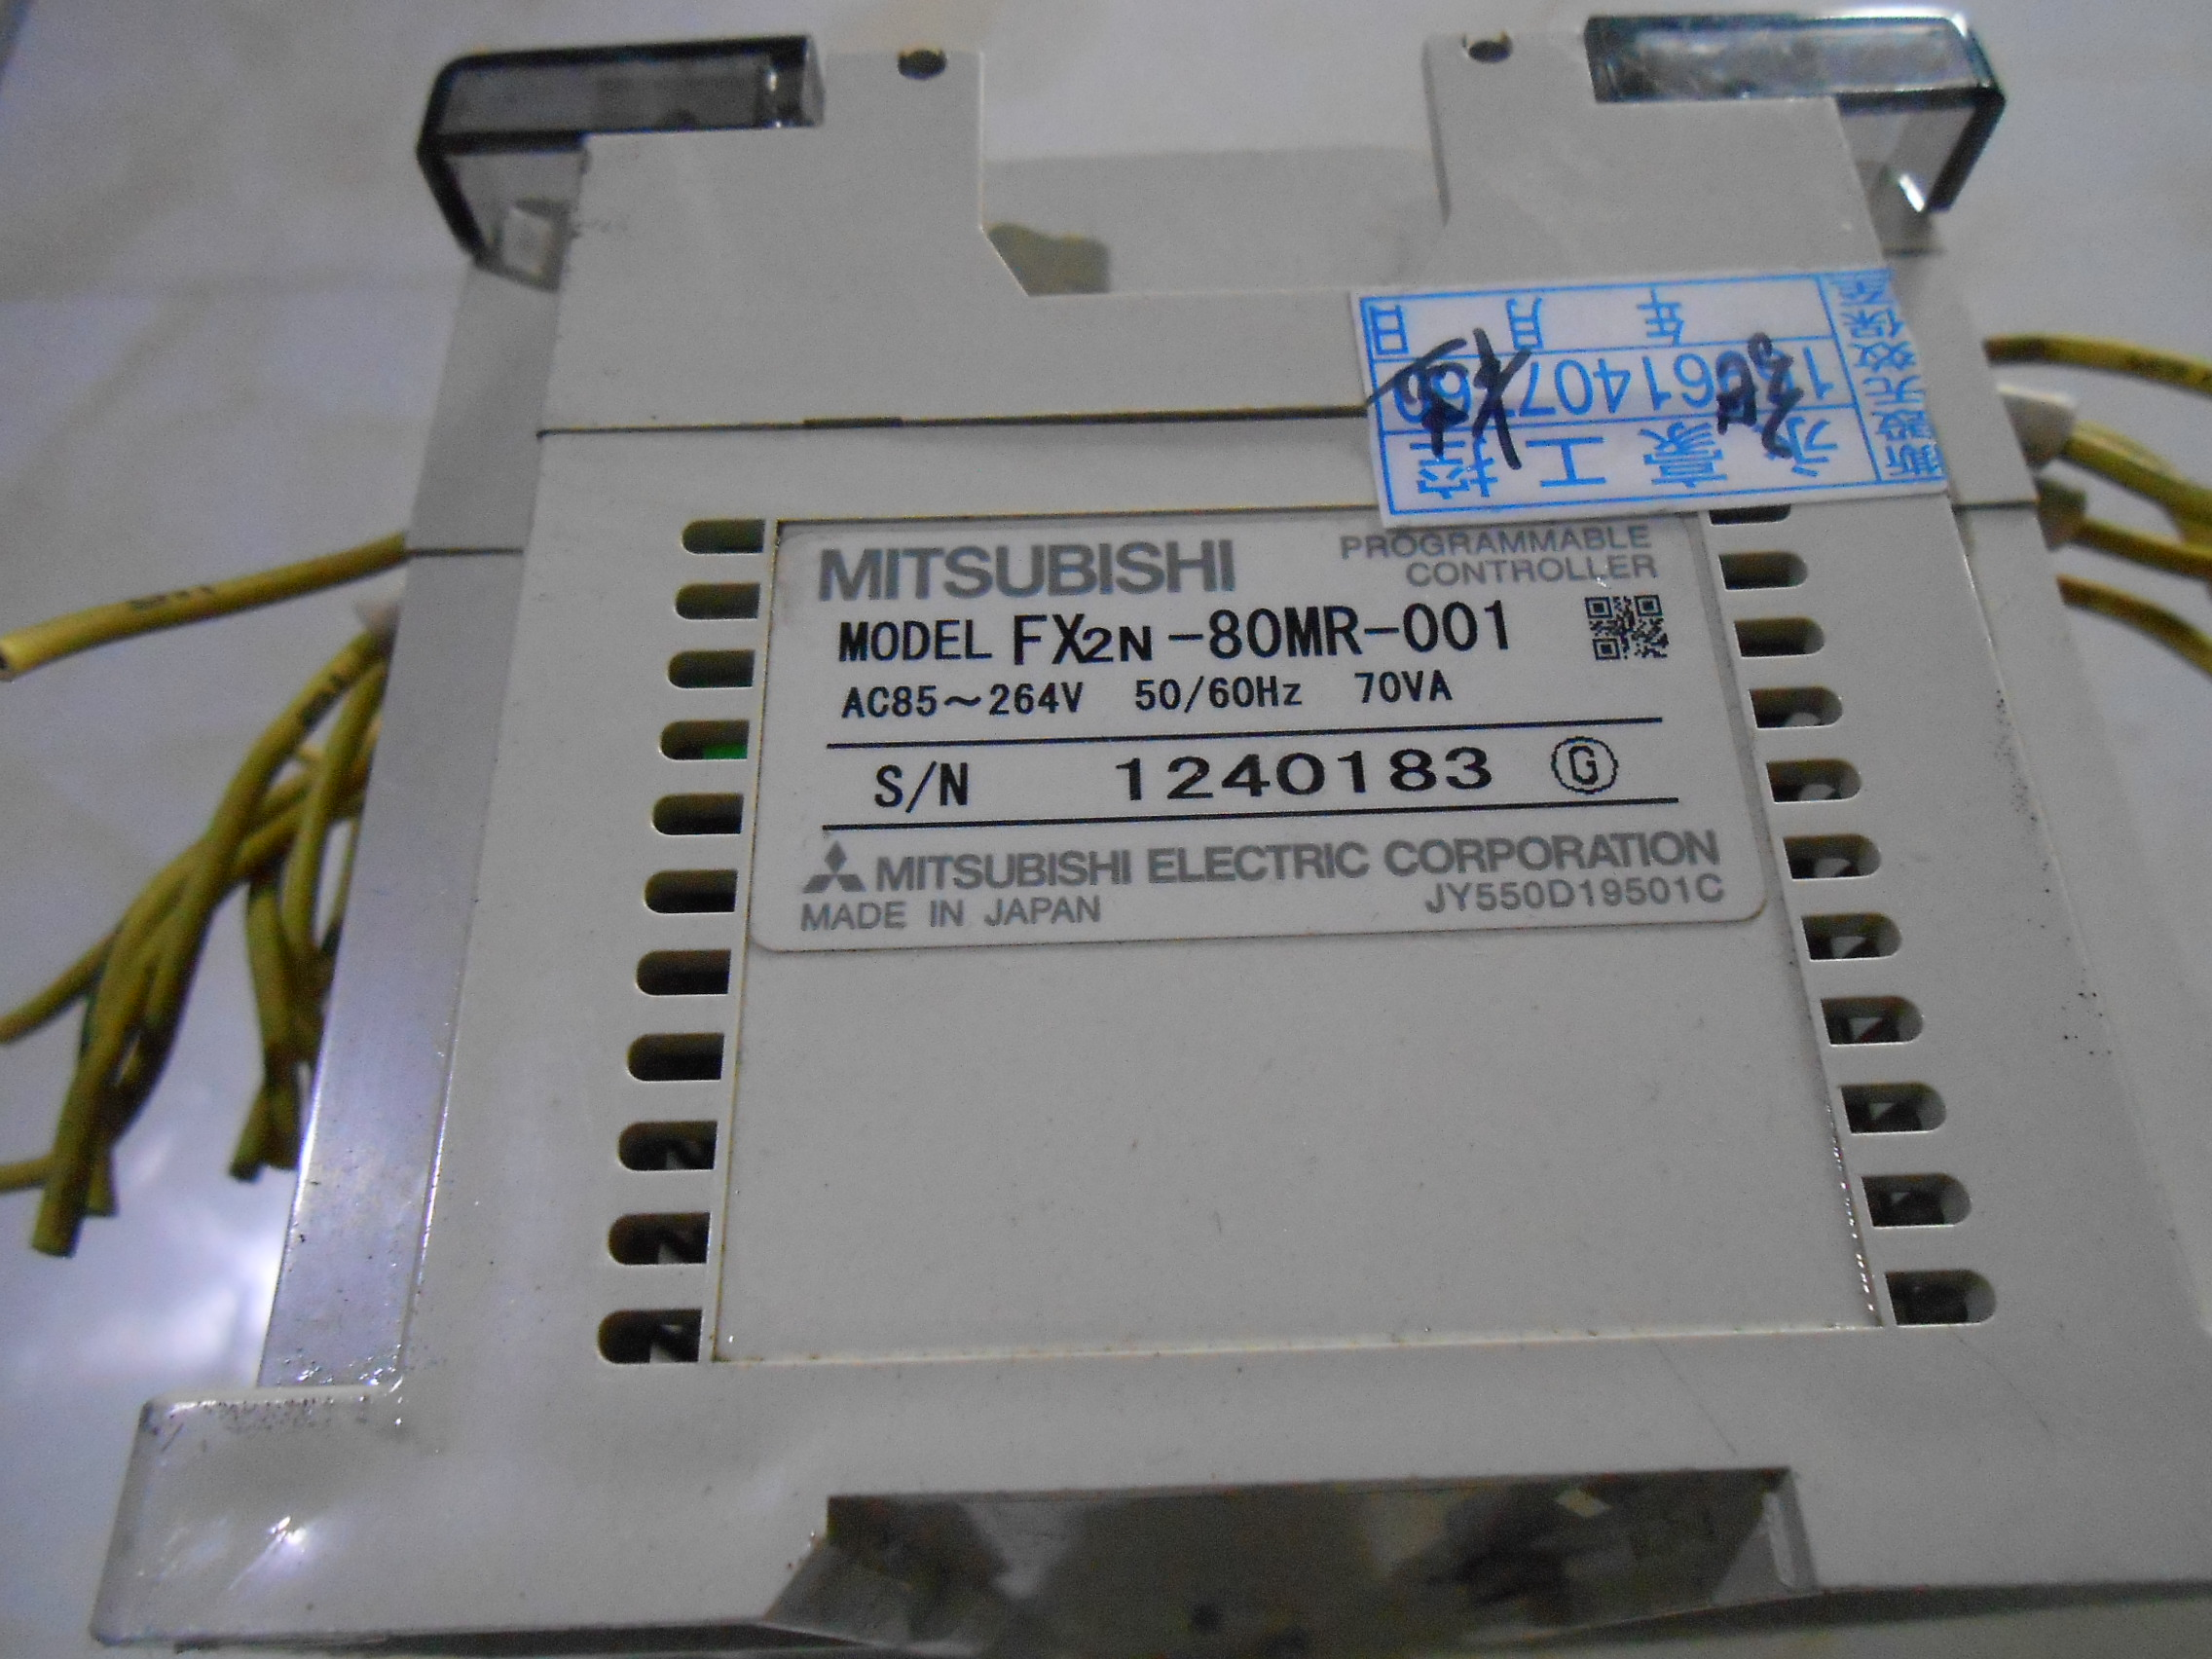 中古GEMAXの三菱PLCFX2N-80MR-001実物図引合代購